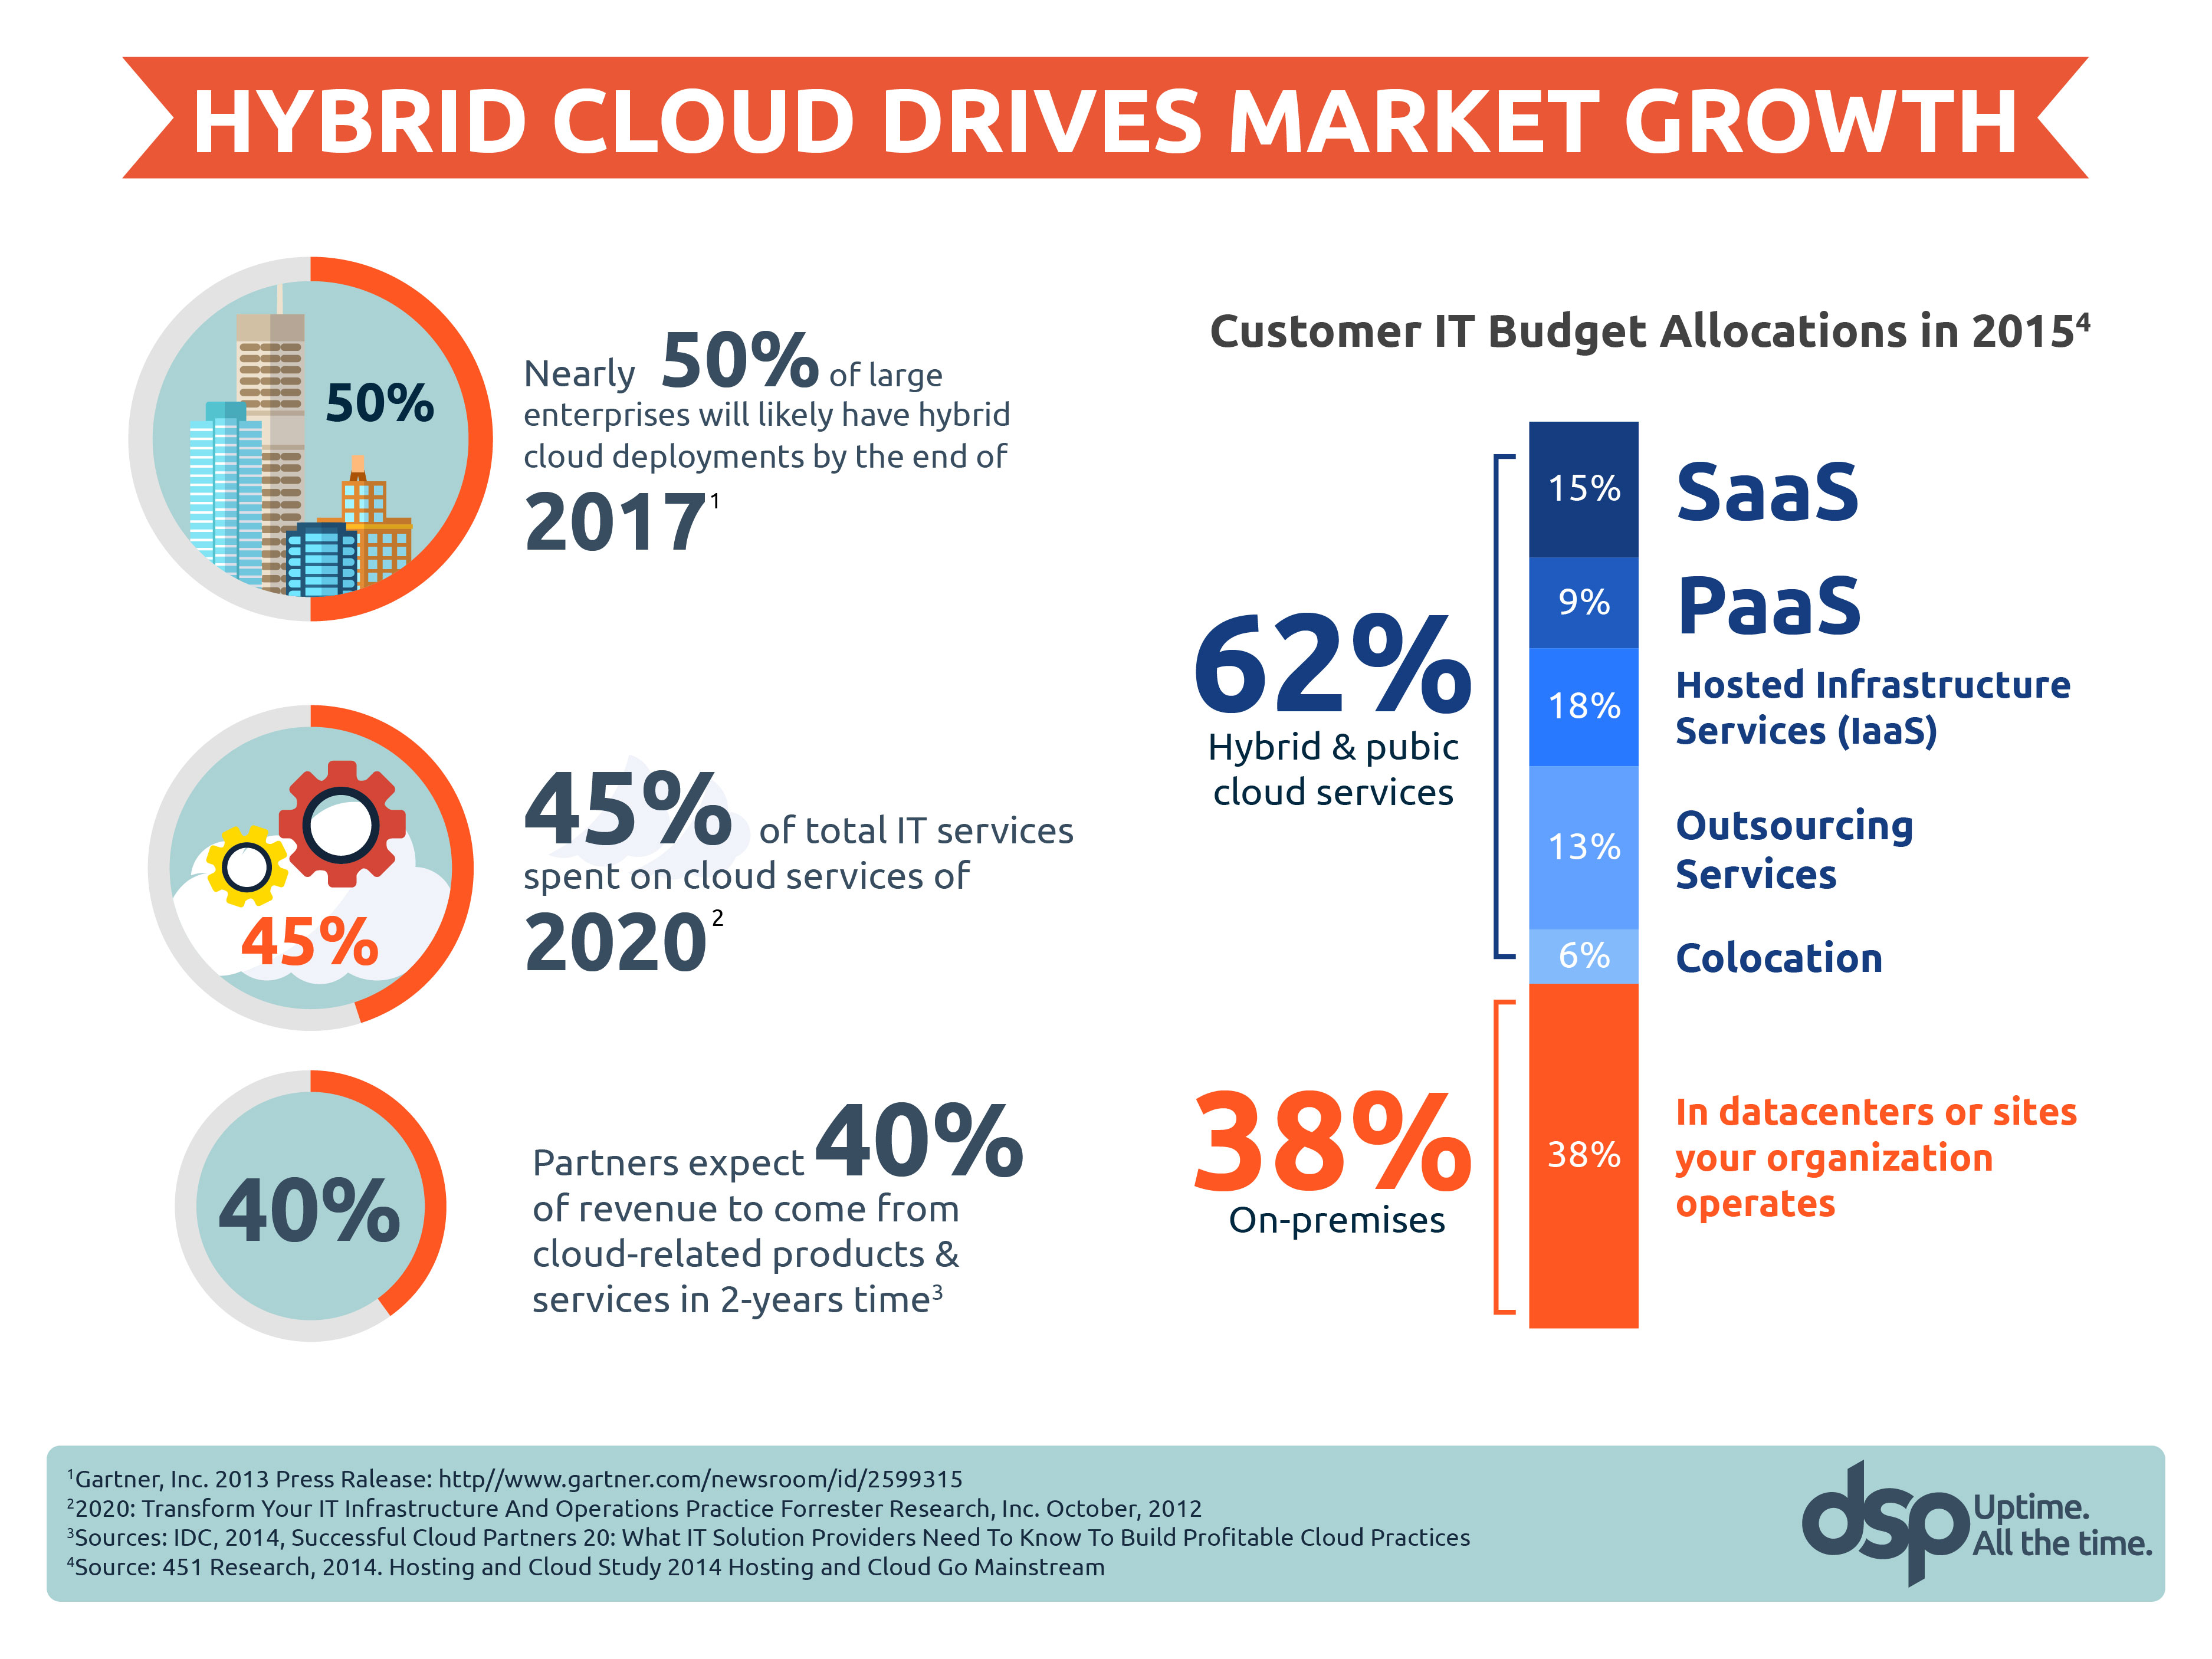 5663-Ajay-Hybrid-Cloud-Solutions